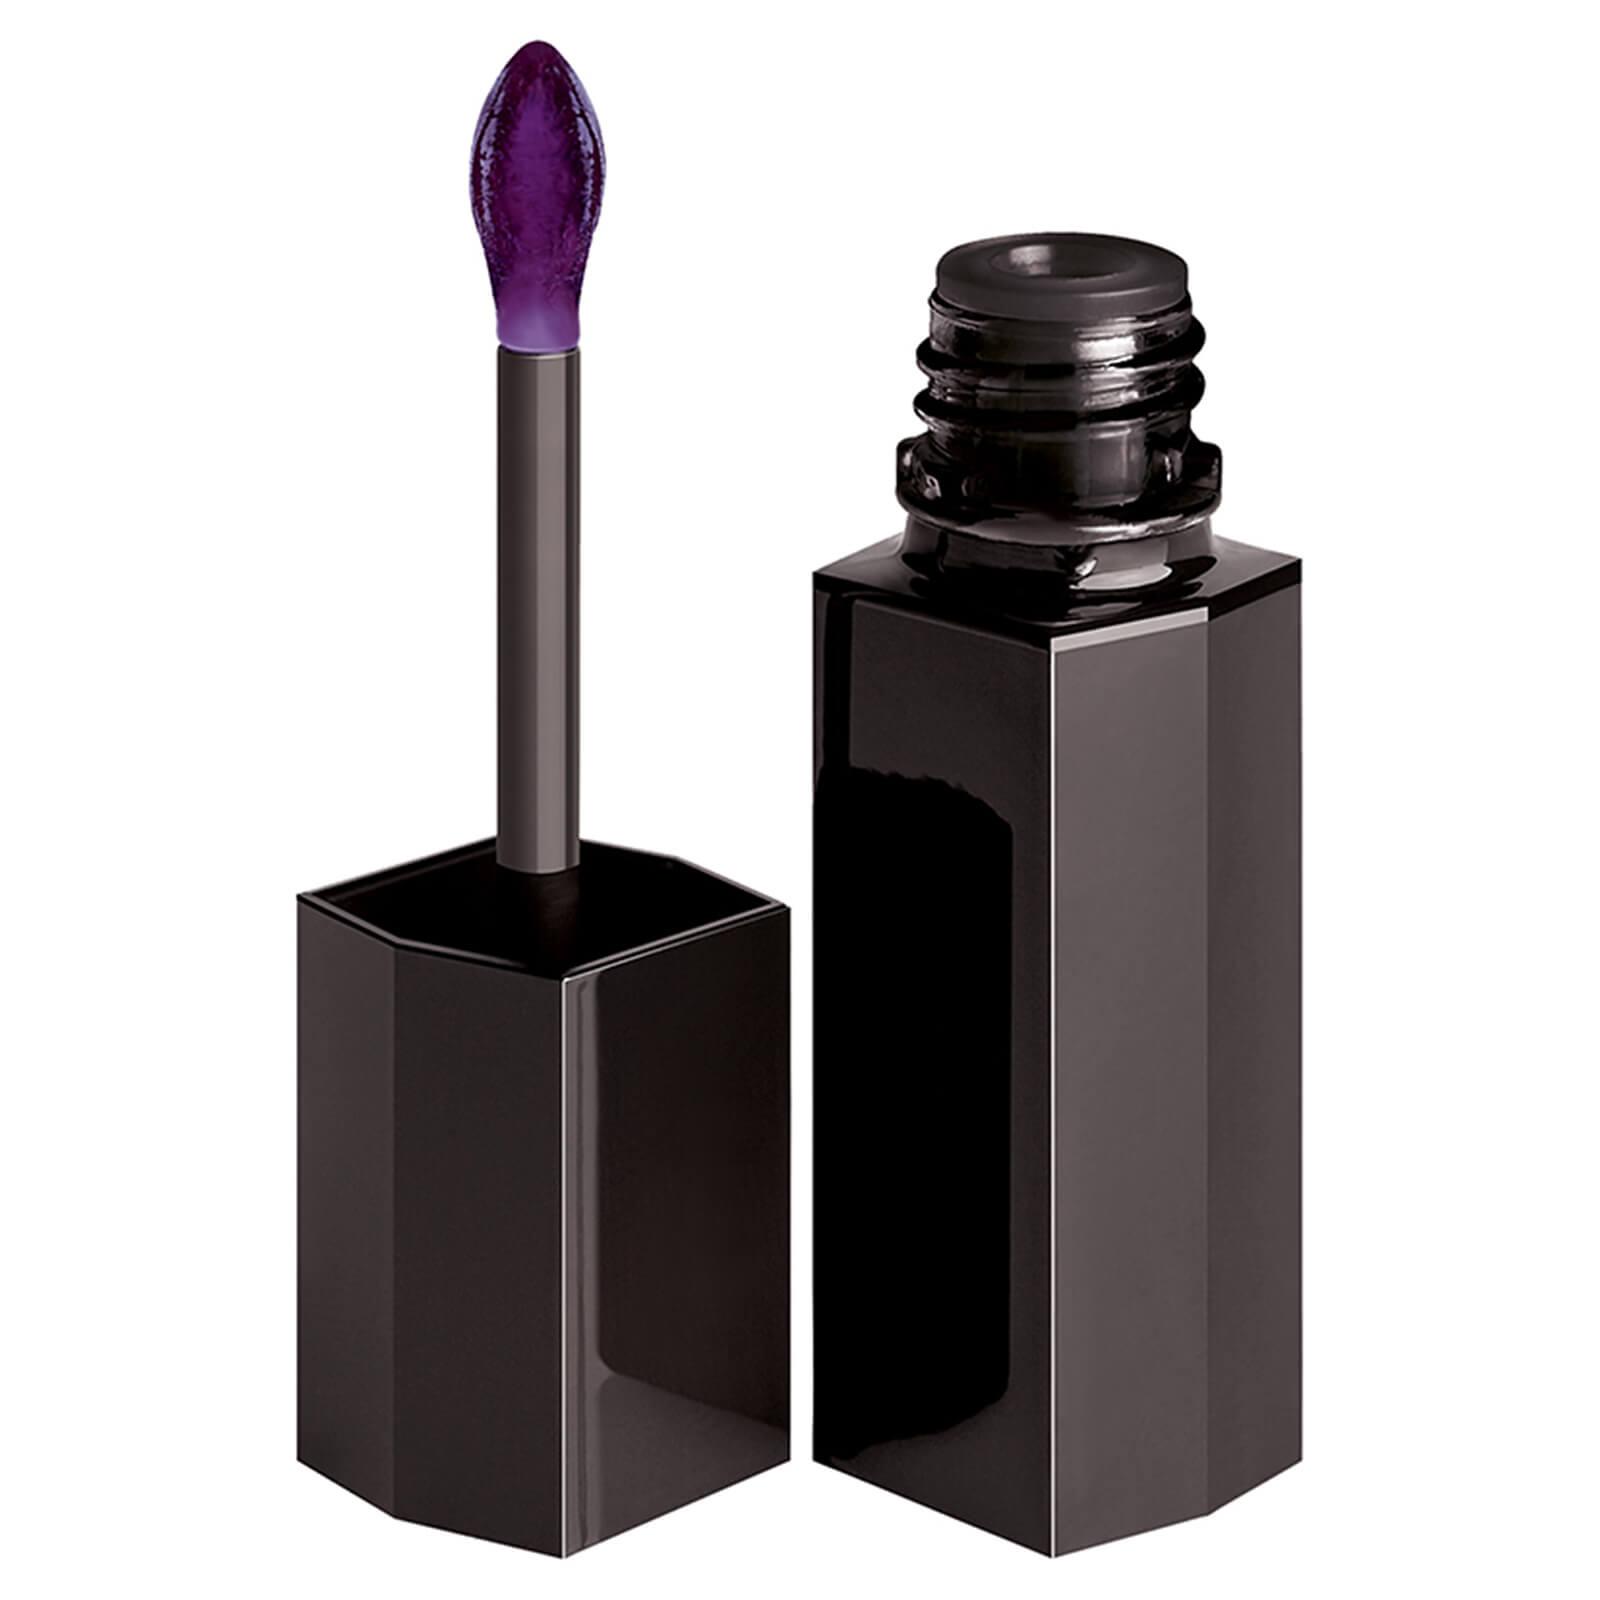 Serge Lutens Water Lip Colour Ink 8ml (Various Shades) - N°4